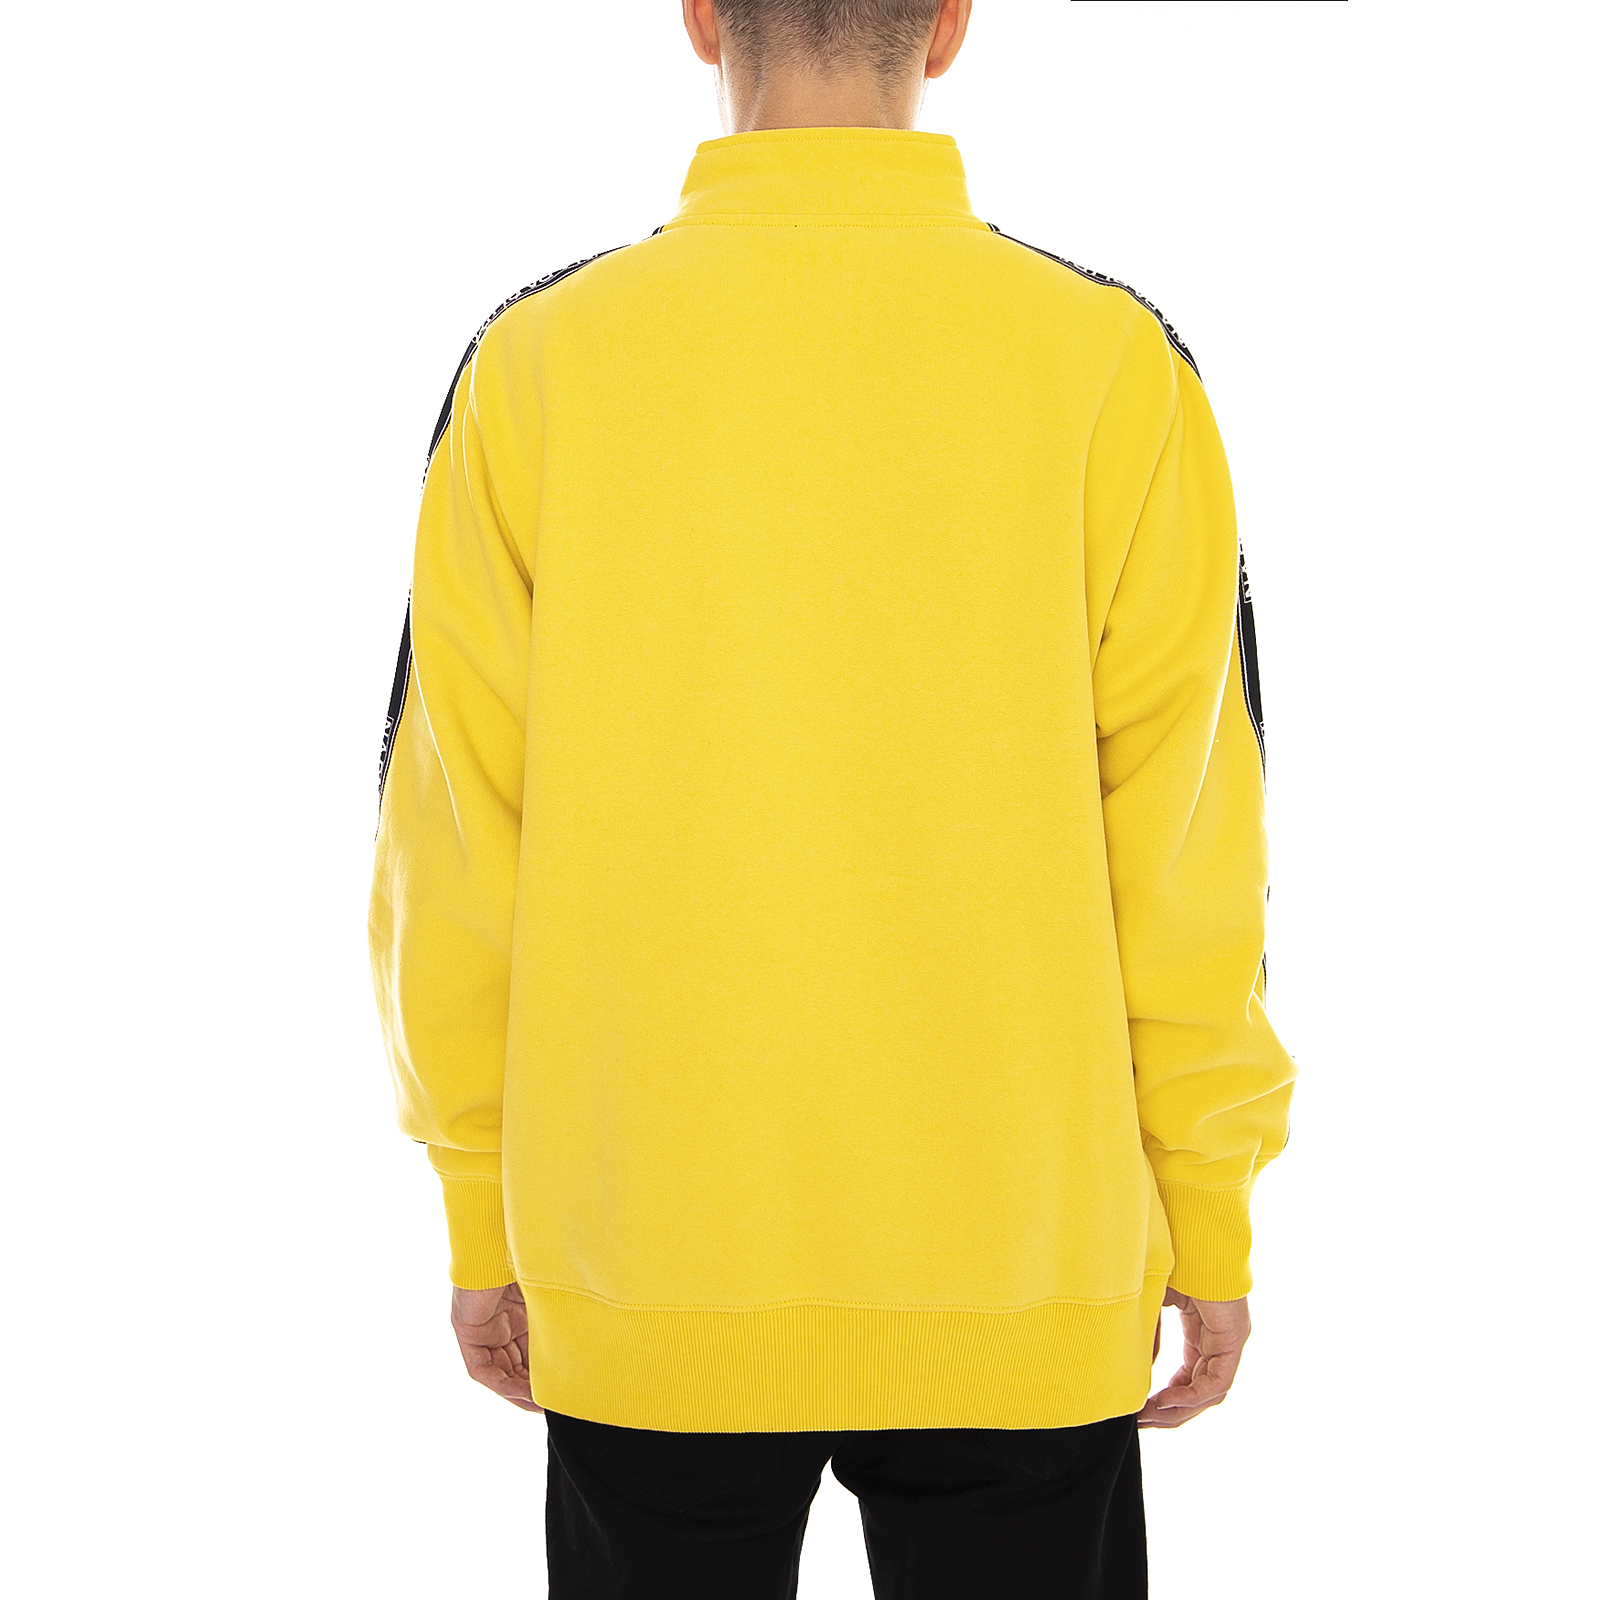 Napapijri Sweatshirt Beja Beja Beja Spark Gelb Gelb c8ae1d